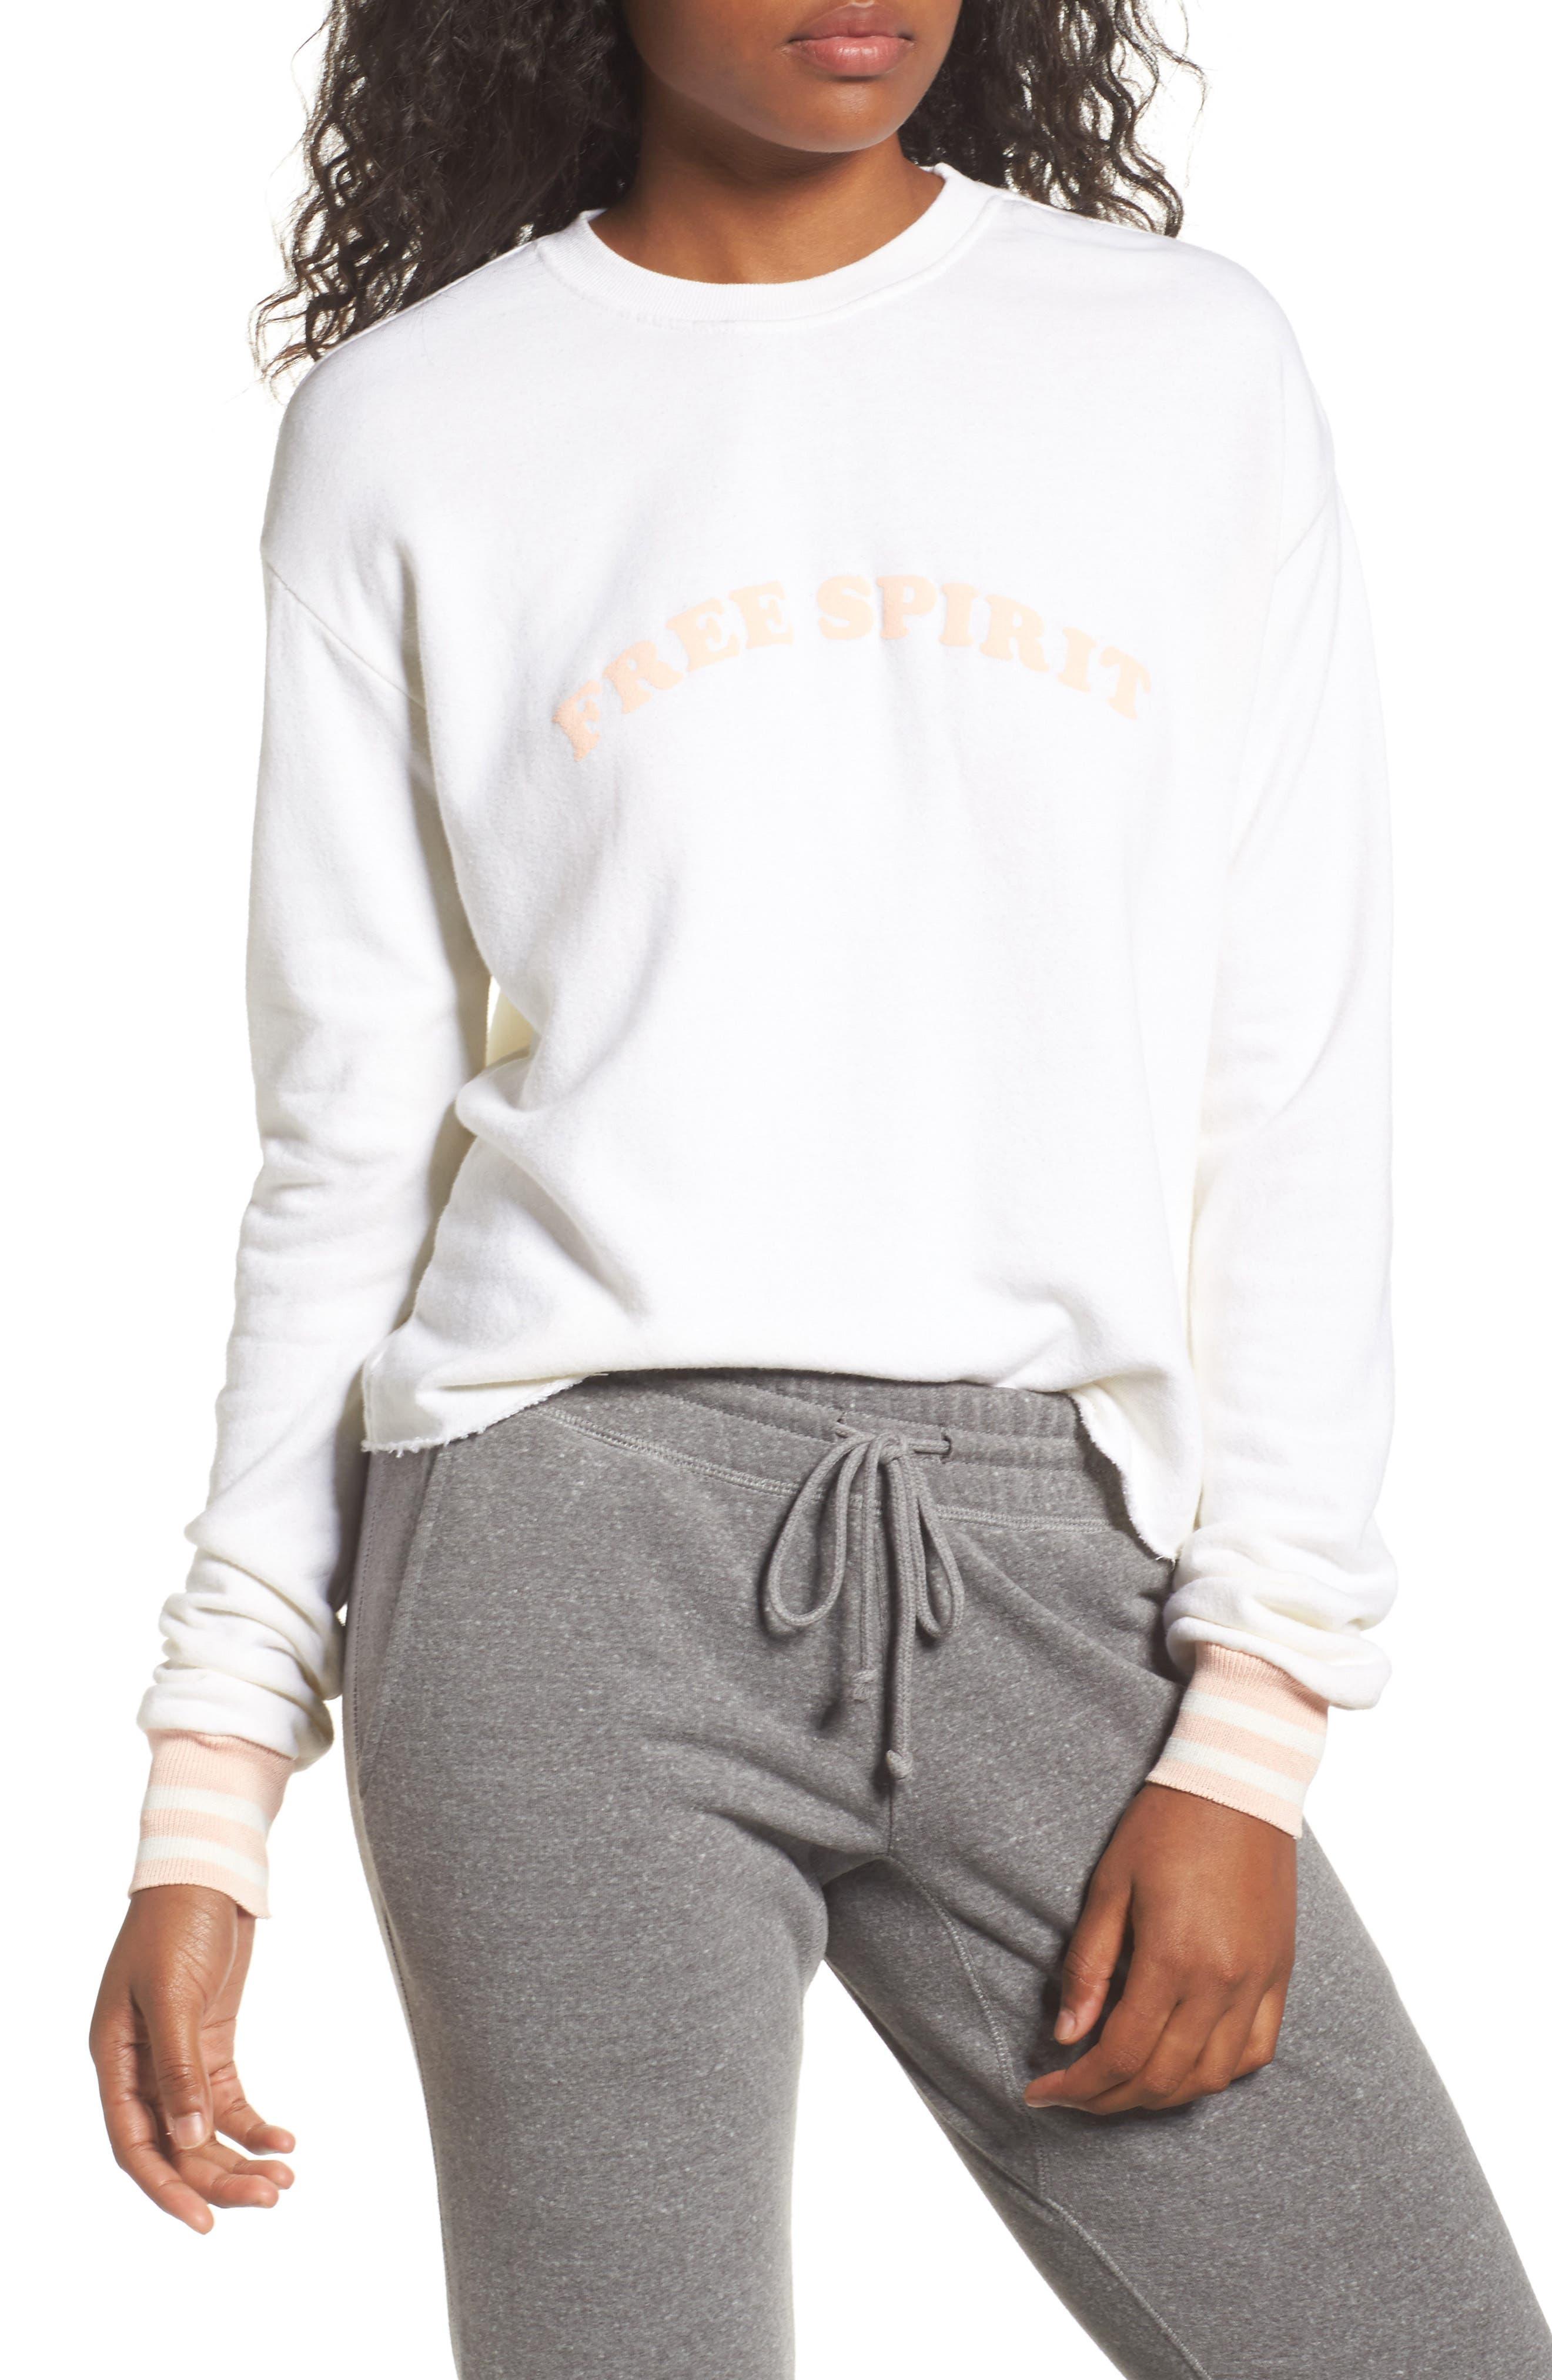 Free Spirit Crop Sweatshirt,                             Main thumbnail 1, color,                             114